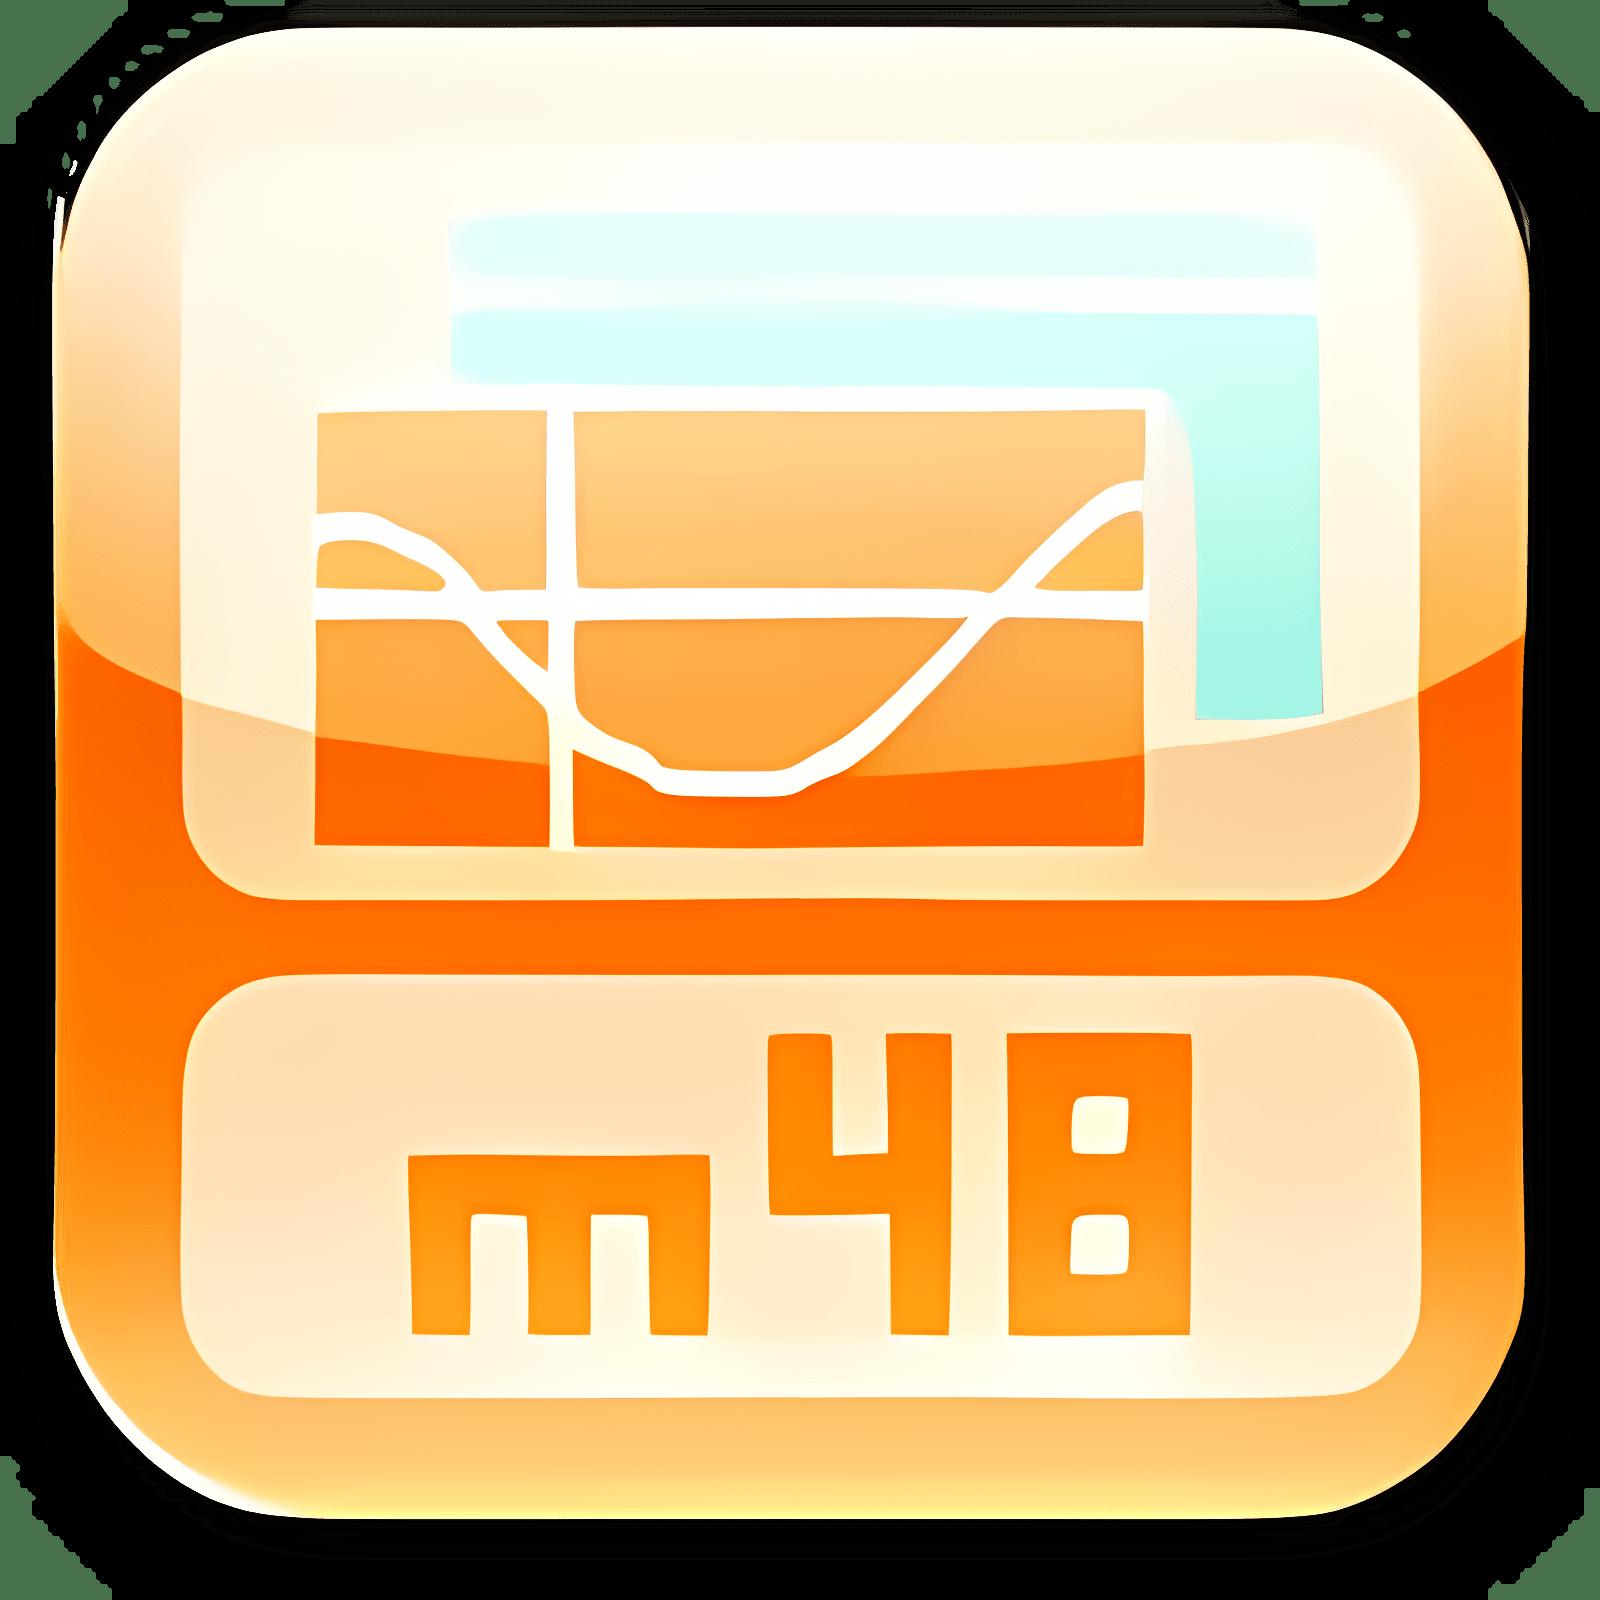 m48 1.2